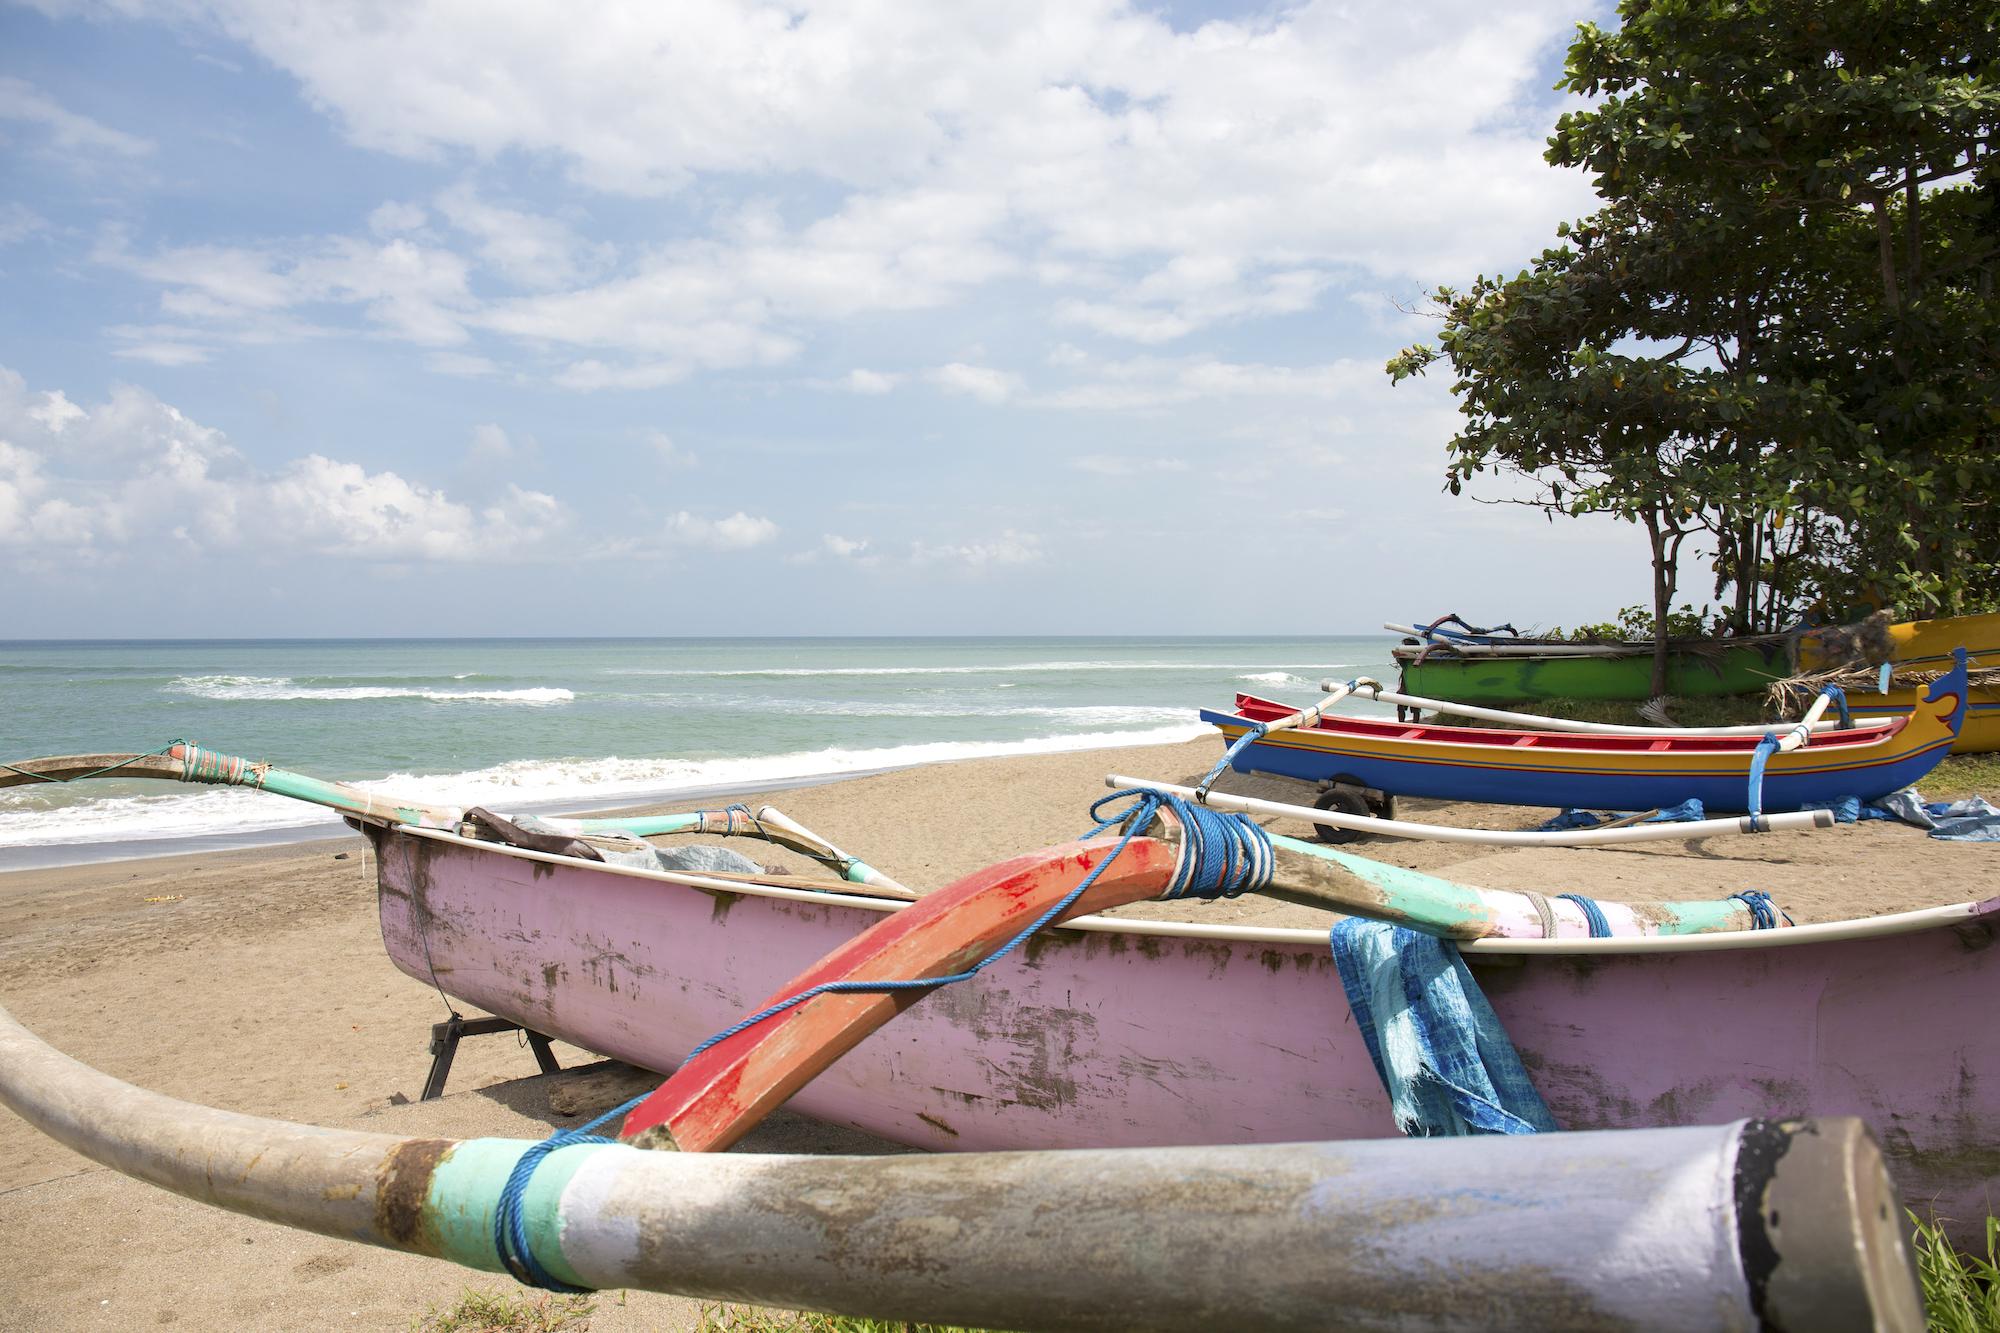 26 Things to do When Staying in Jimbaran